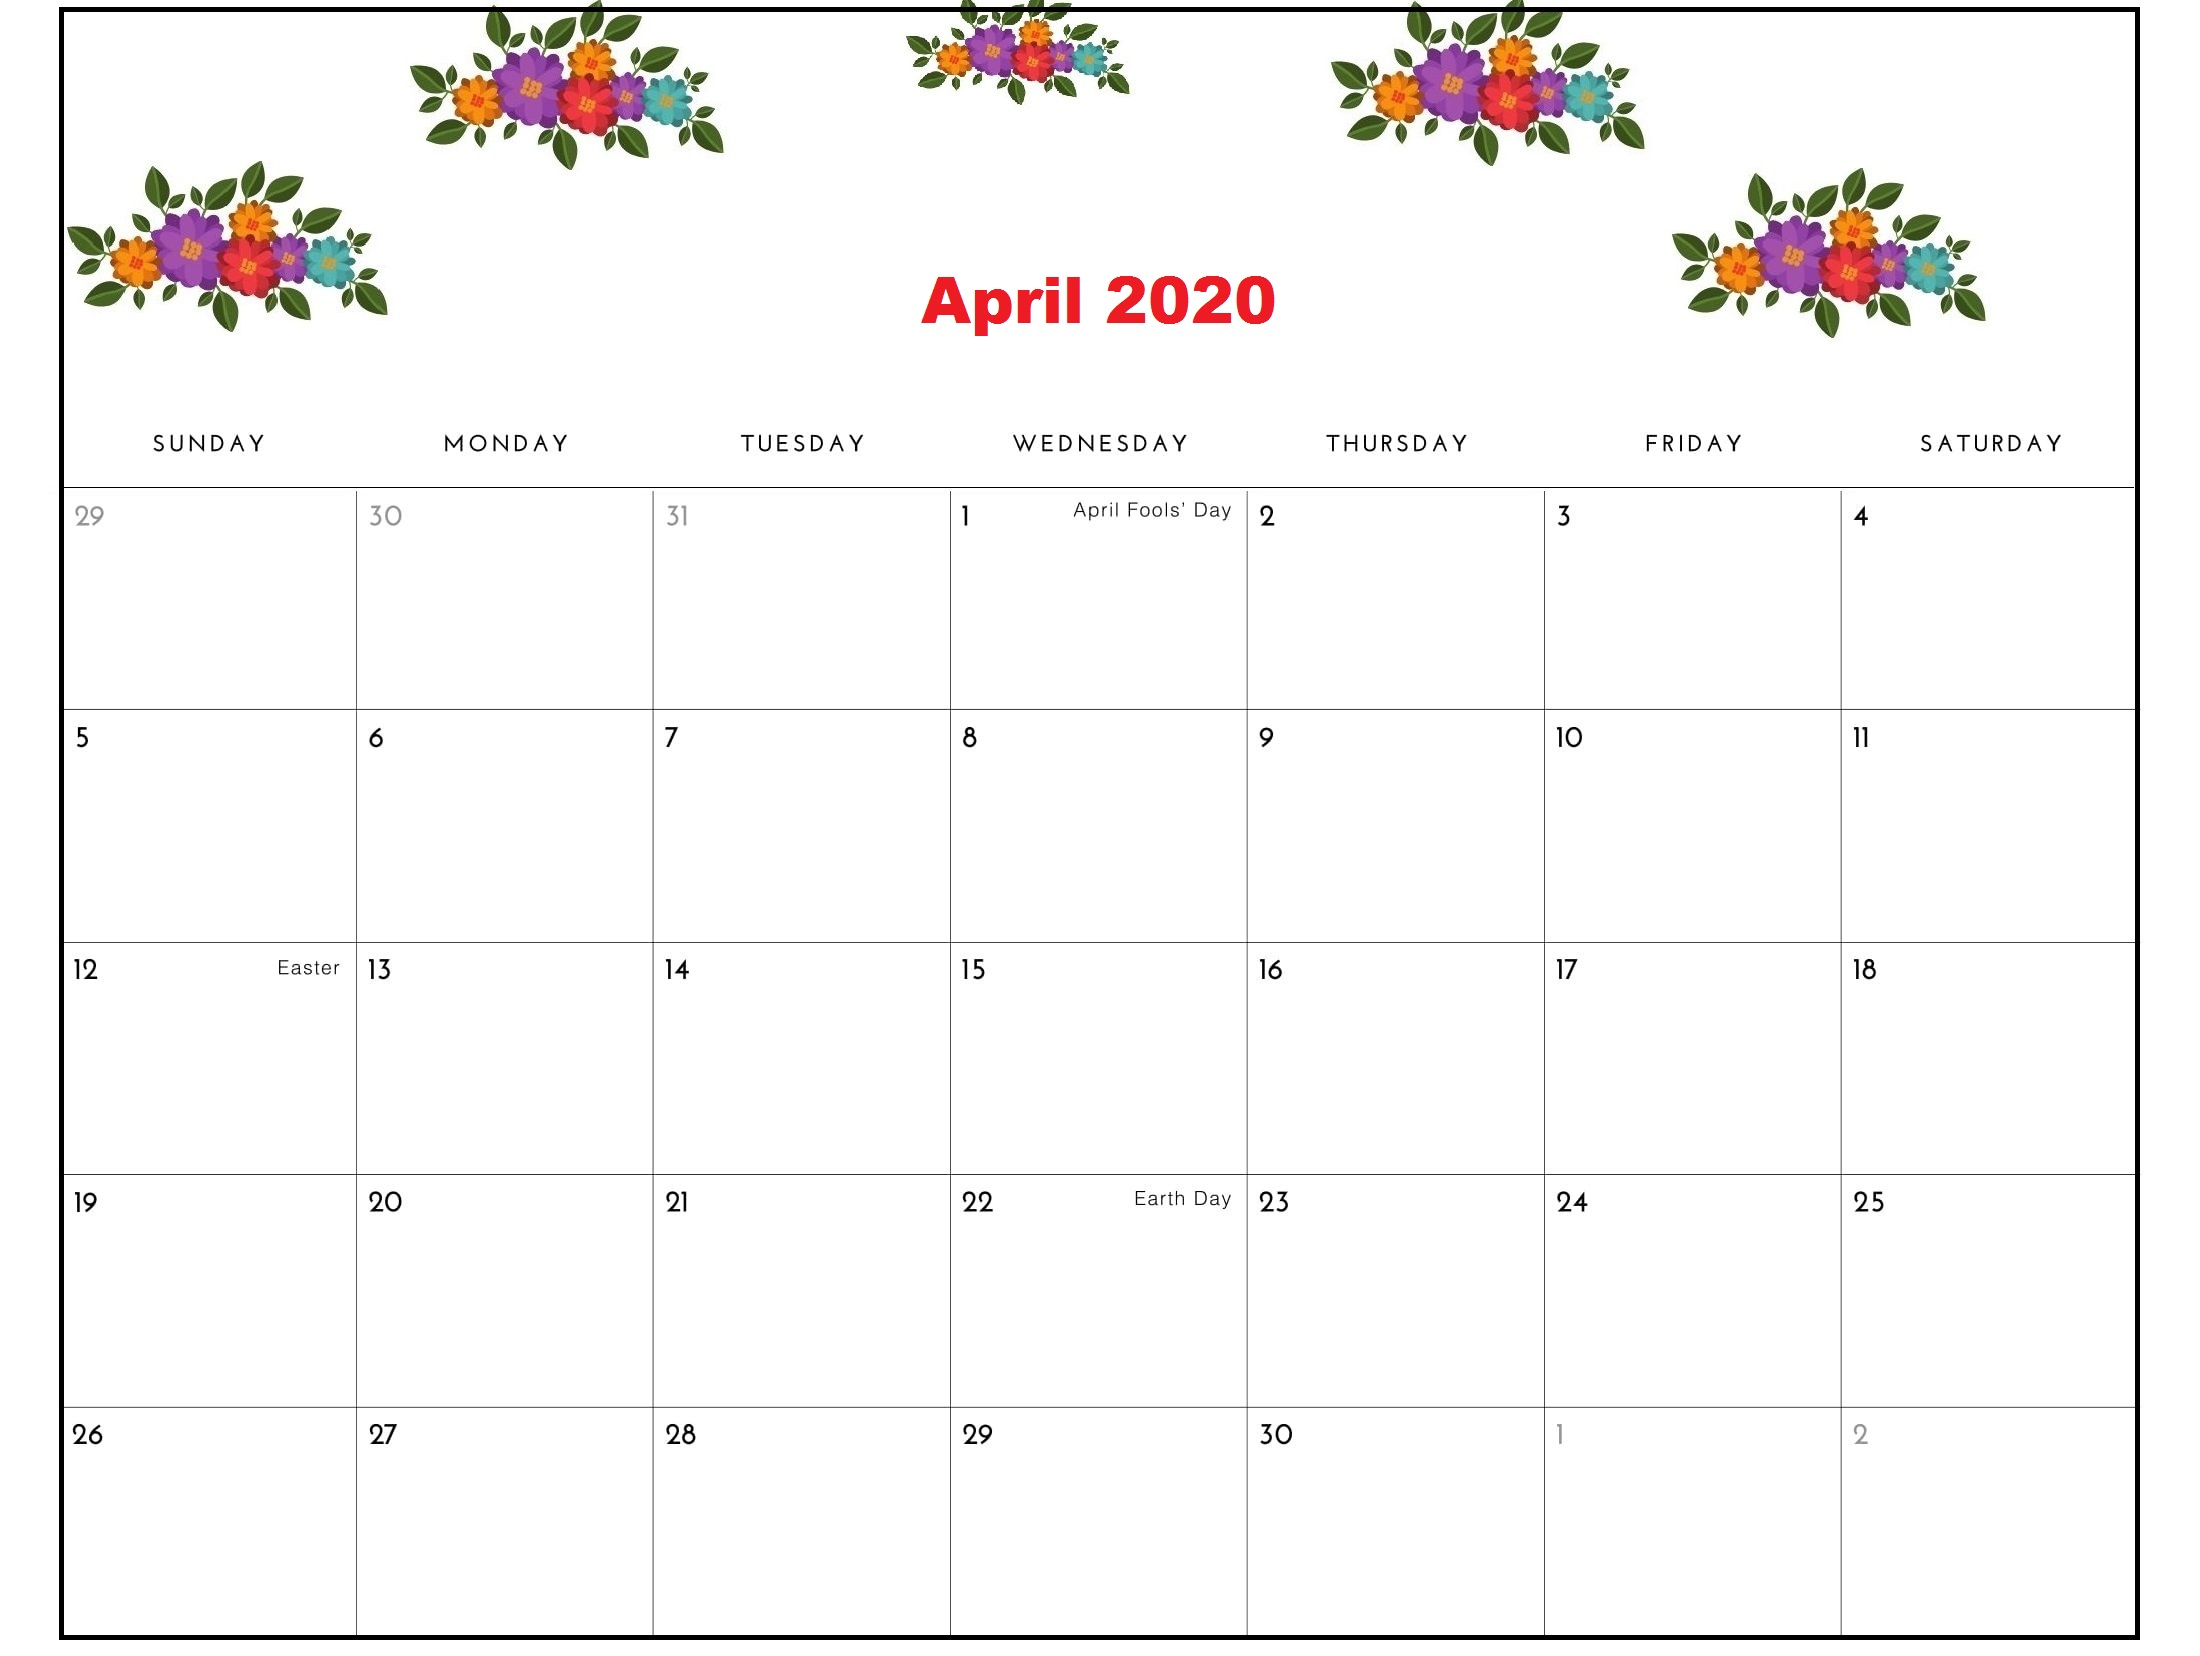 Free April 2020 Calendar Printable In Pdf, Word And Excel throughout April 2020 Printable Calendar